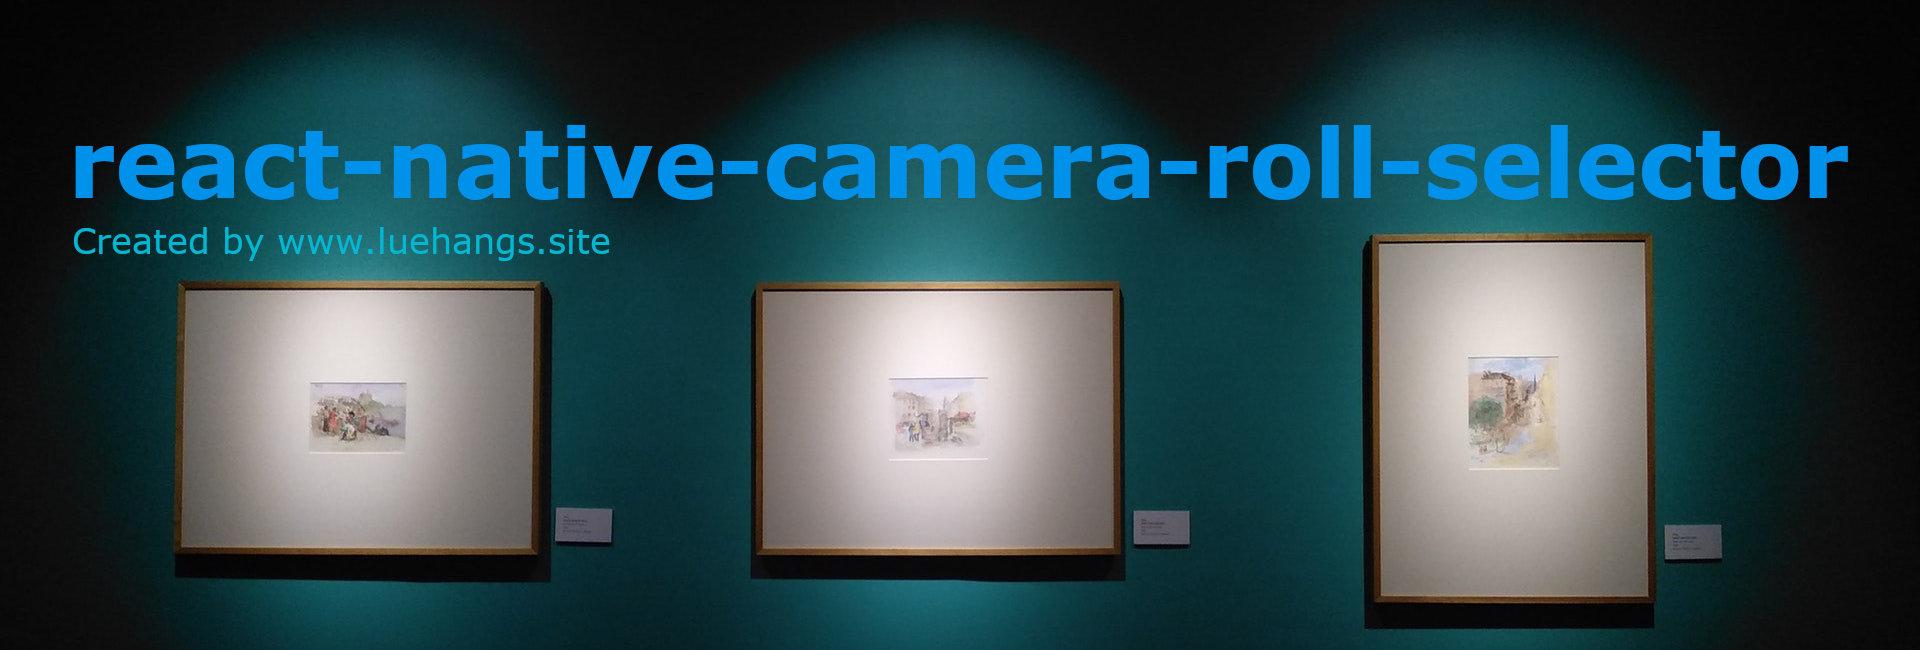 react-native-camera-roll-selector